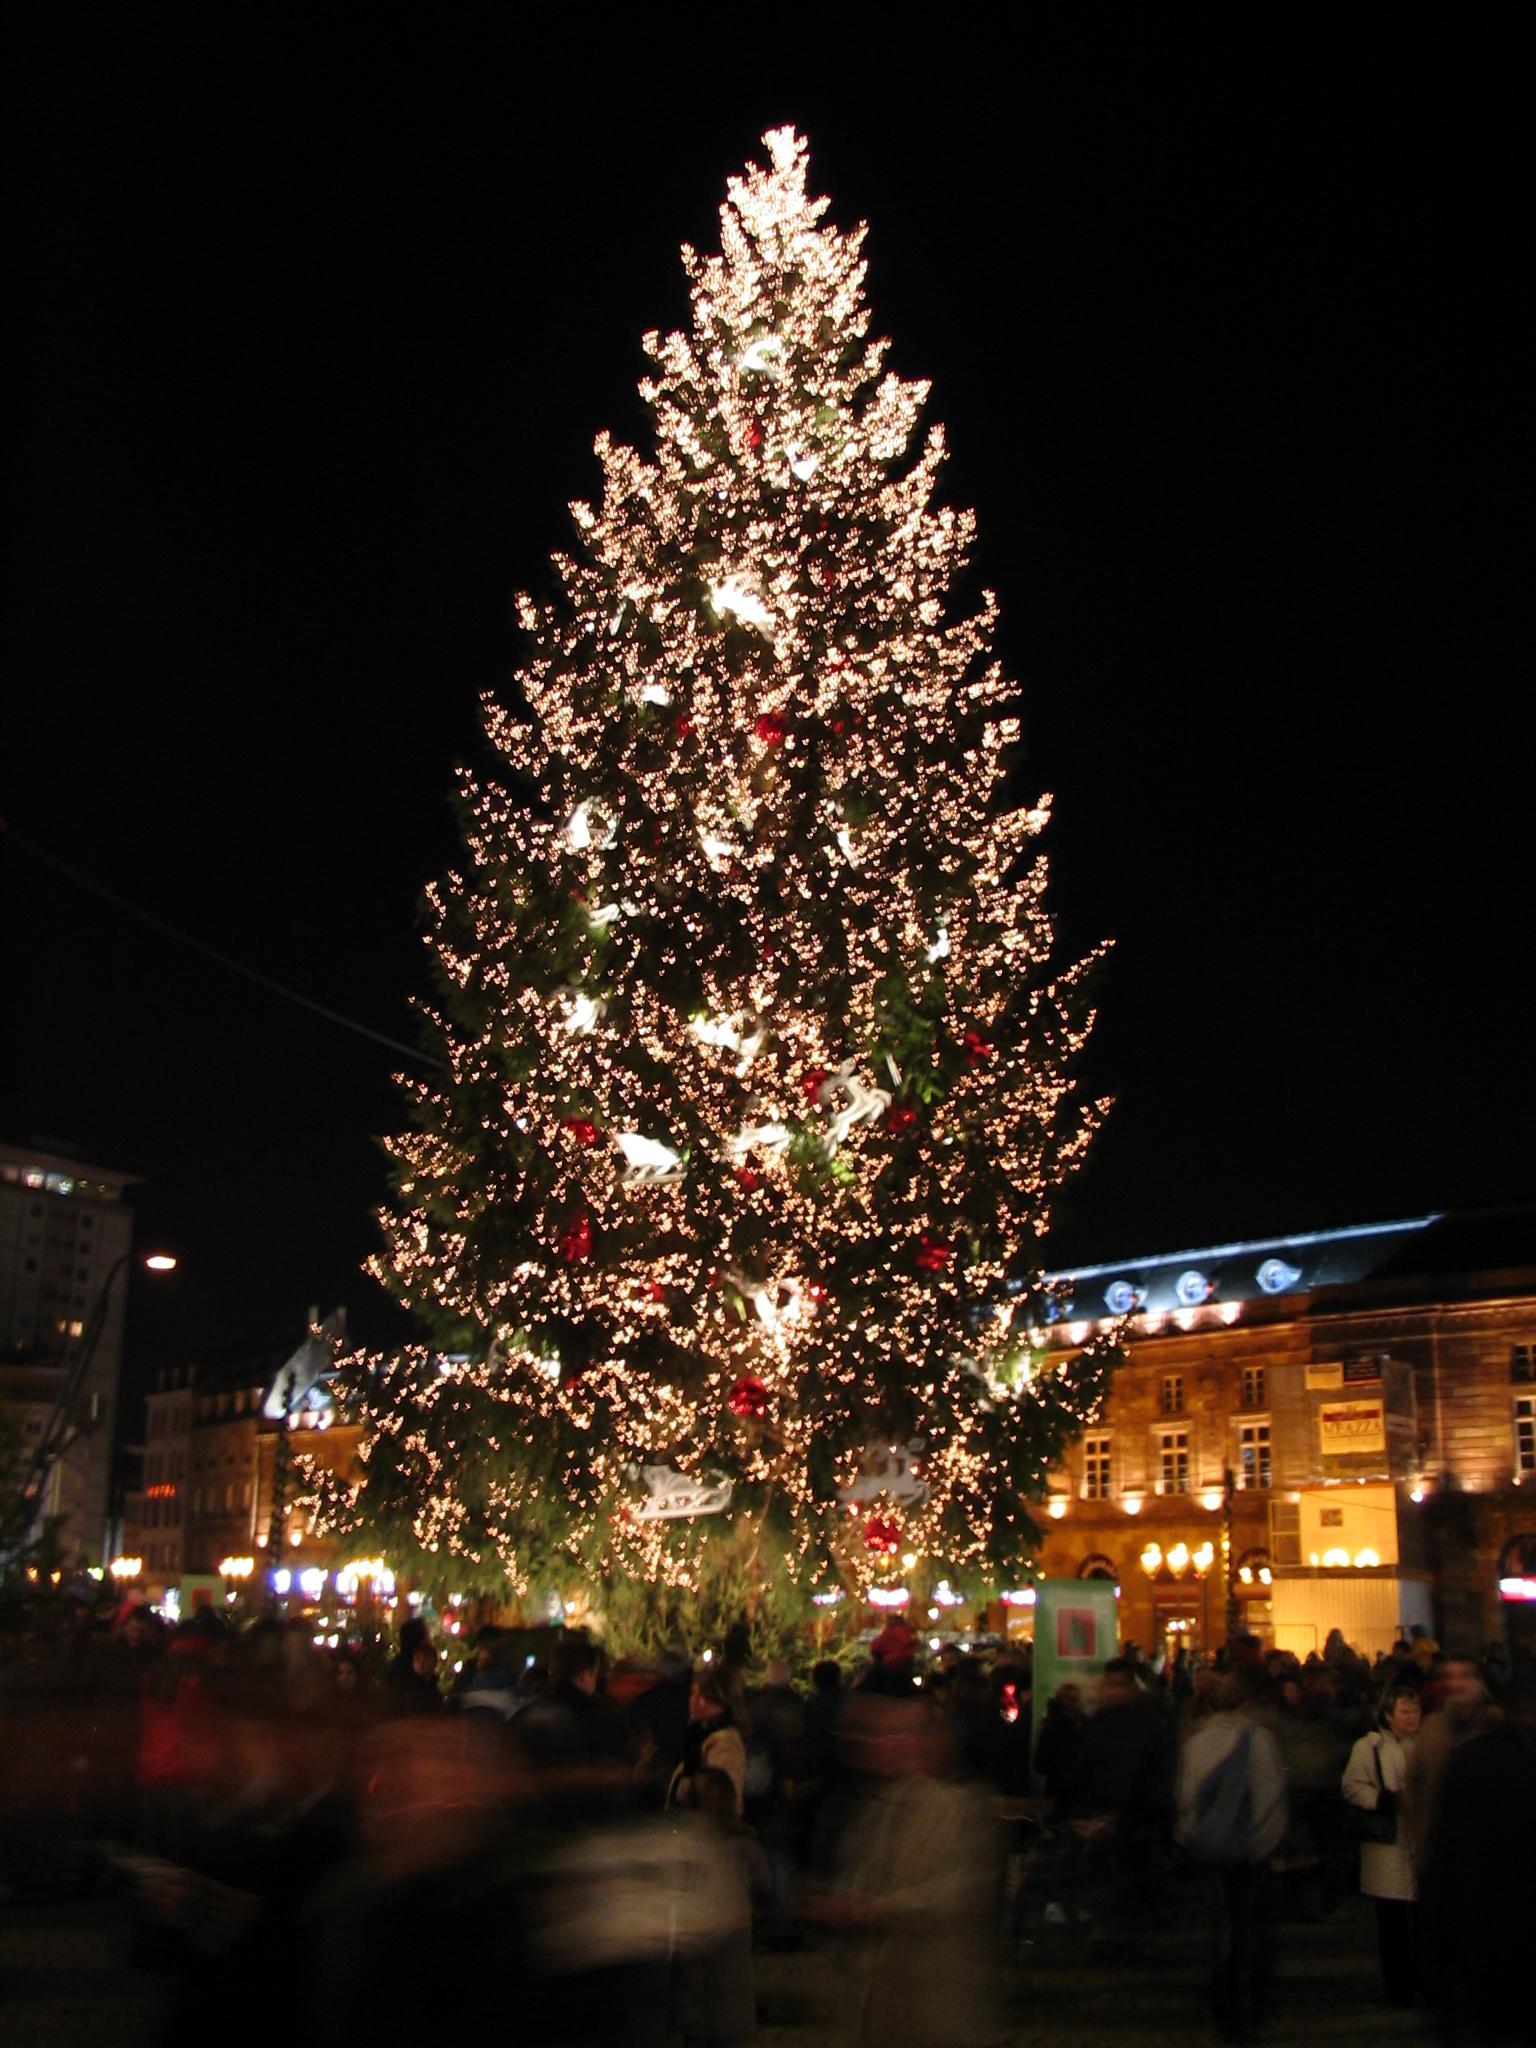 #C88003 Noël à Strasbourg 5517 décorations de noel strasbourg 1536x2048 px @ aertt.com